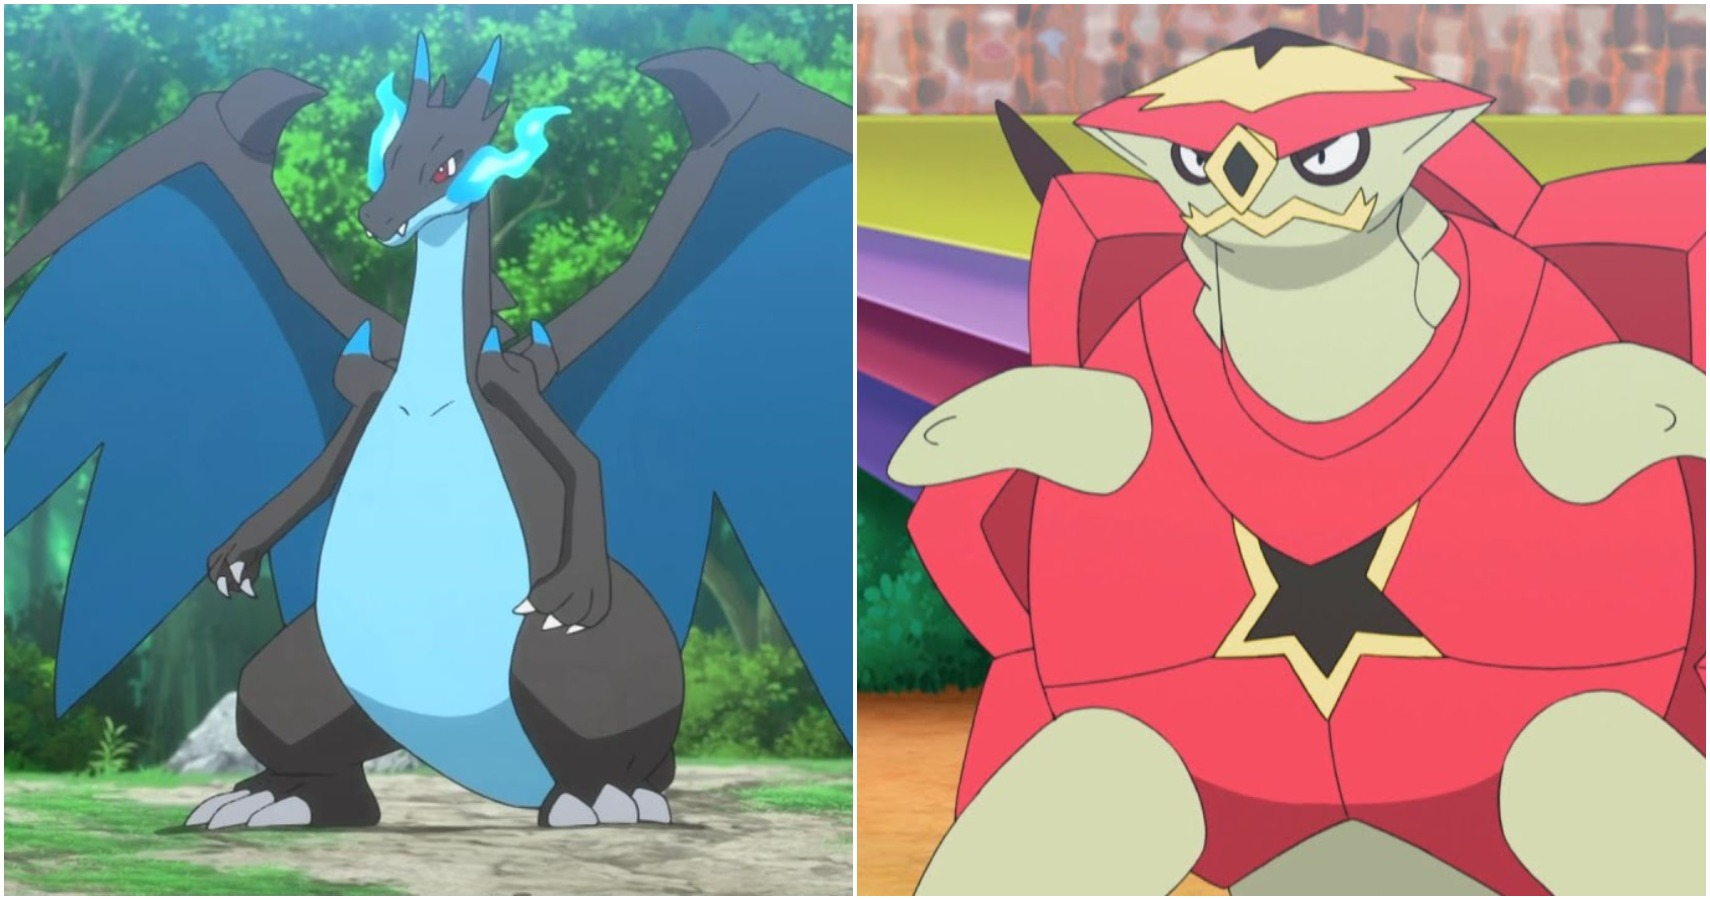 Pokémon: 5 Coolest Fire-Type Pokémon Designs (& 5 Of The Worst)